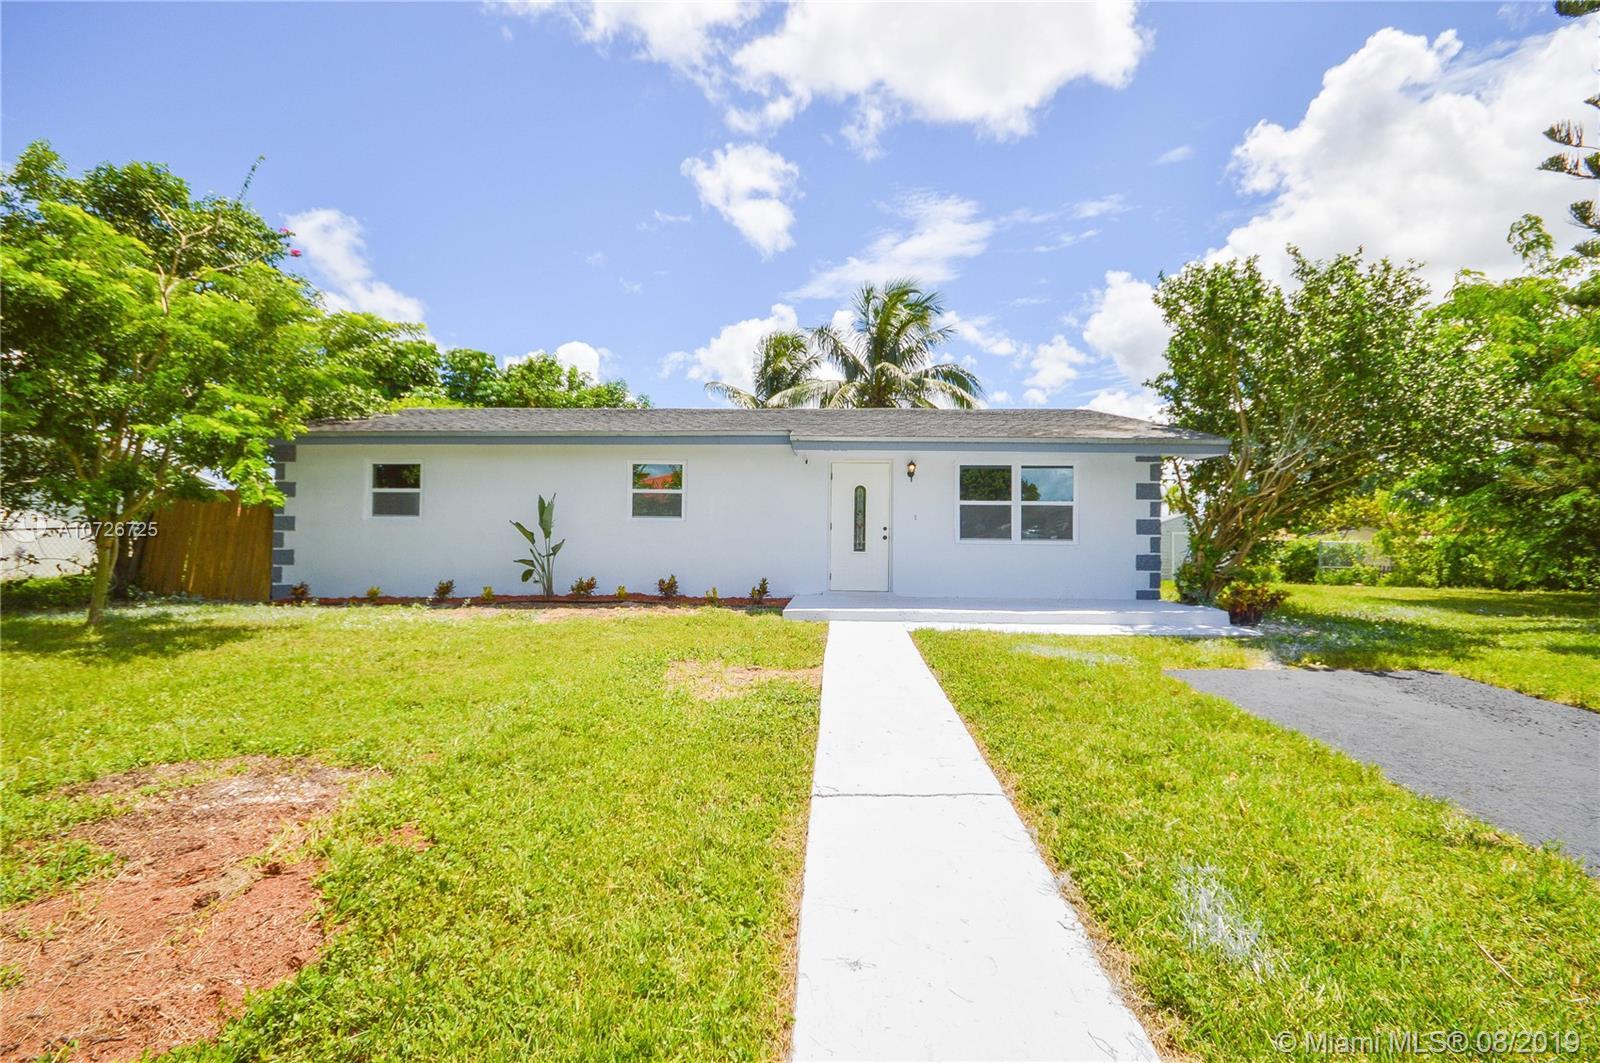 15280 SW 301st St, Homestead, Florida